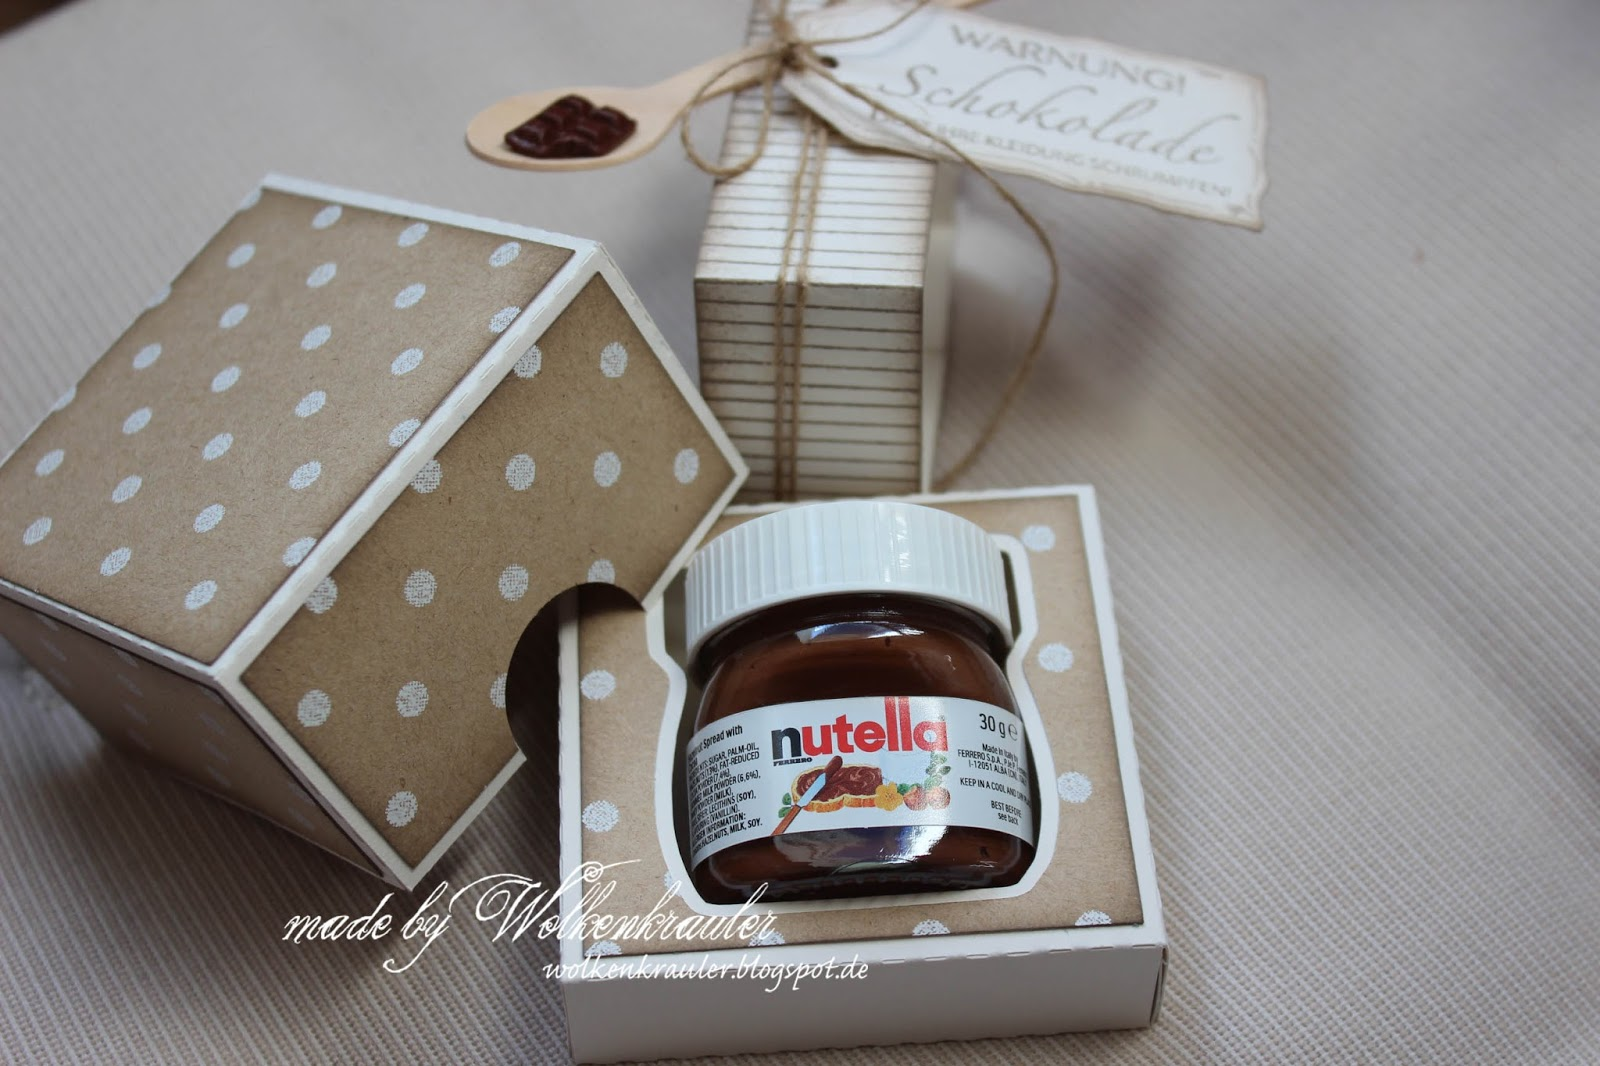 wolkenkrauler mini nutella verpackung. Black Bedroom Furniture Sets. Home Design Ideas